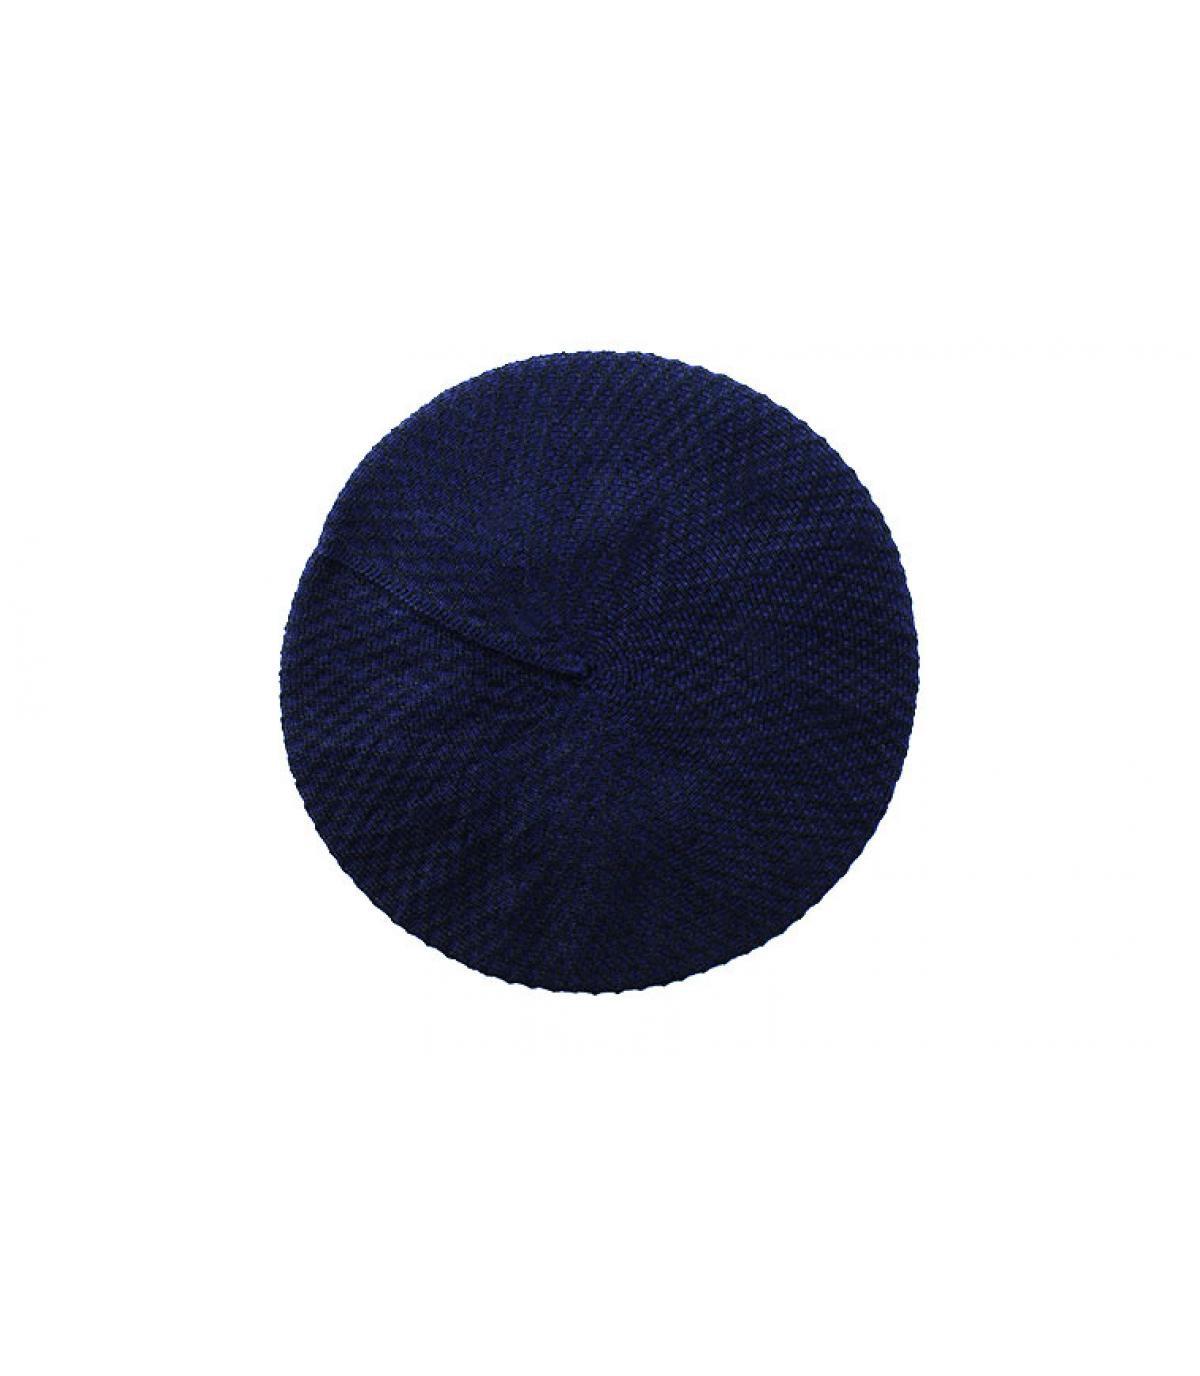 Barett Baumwolle blau Laulhère